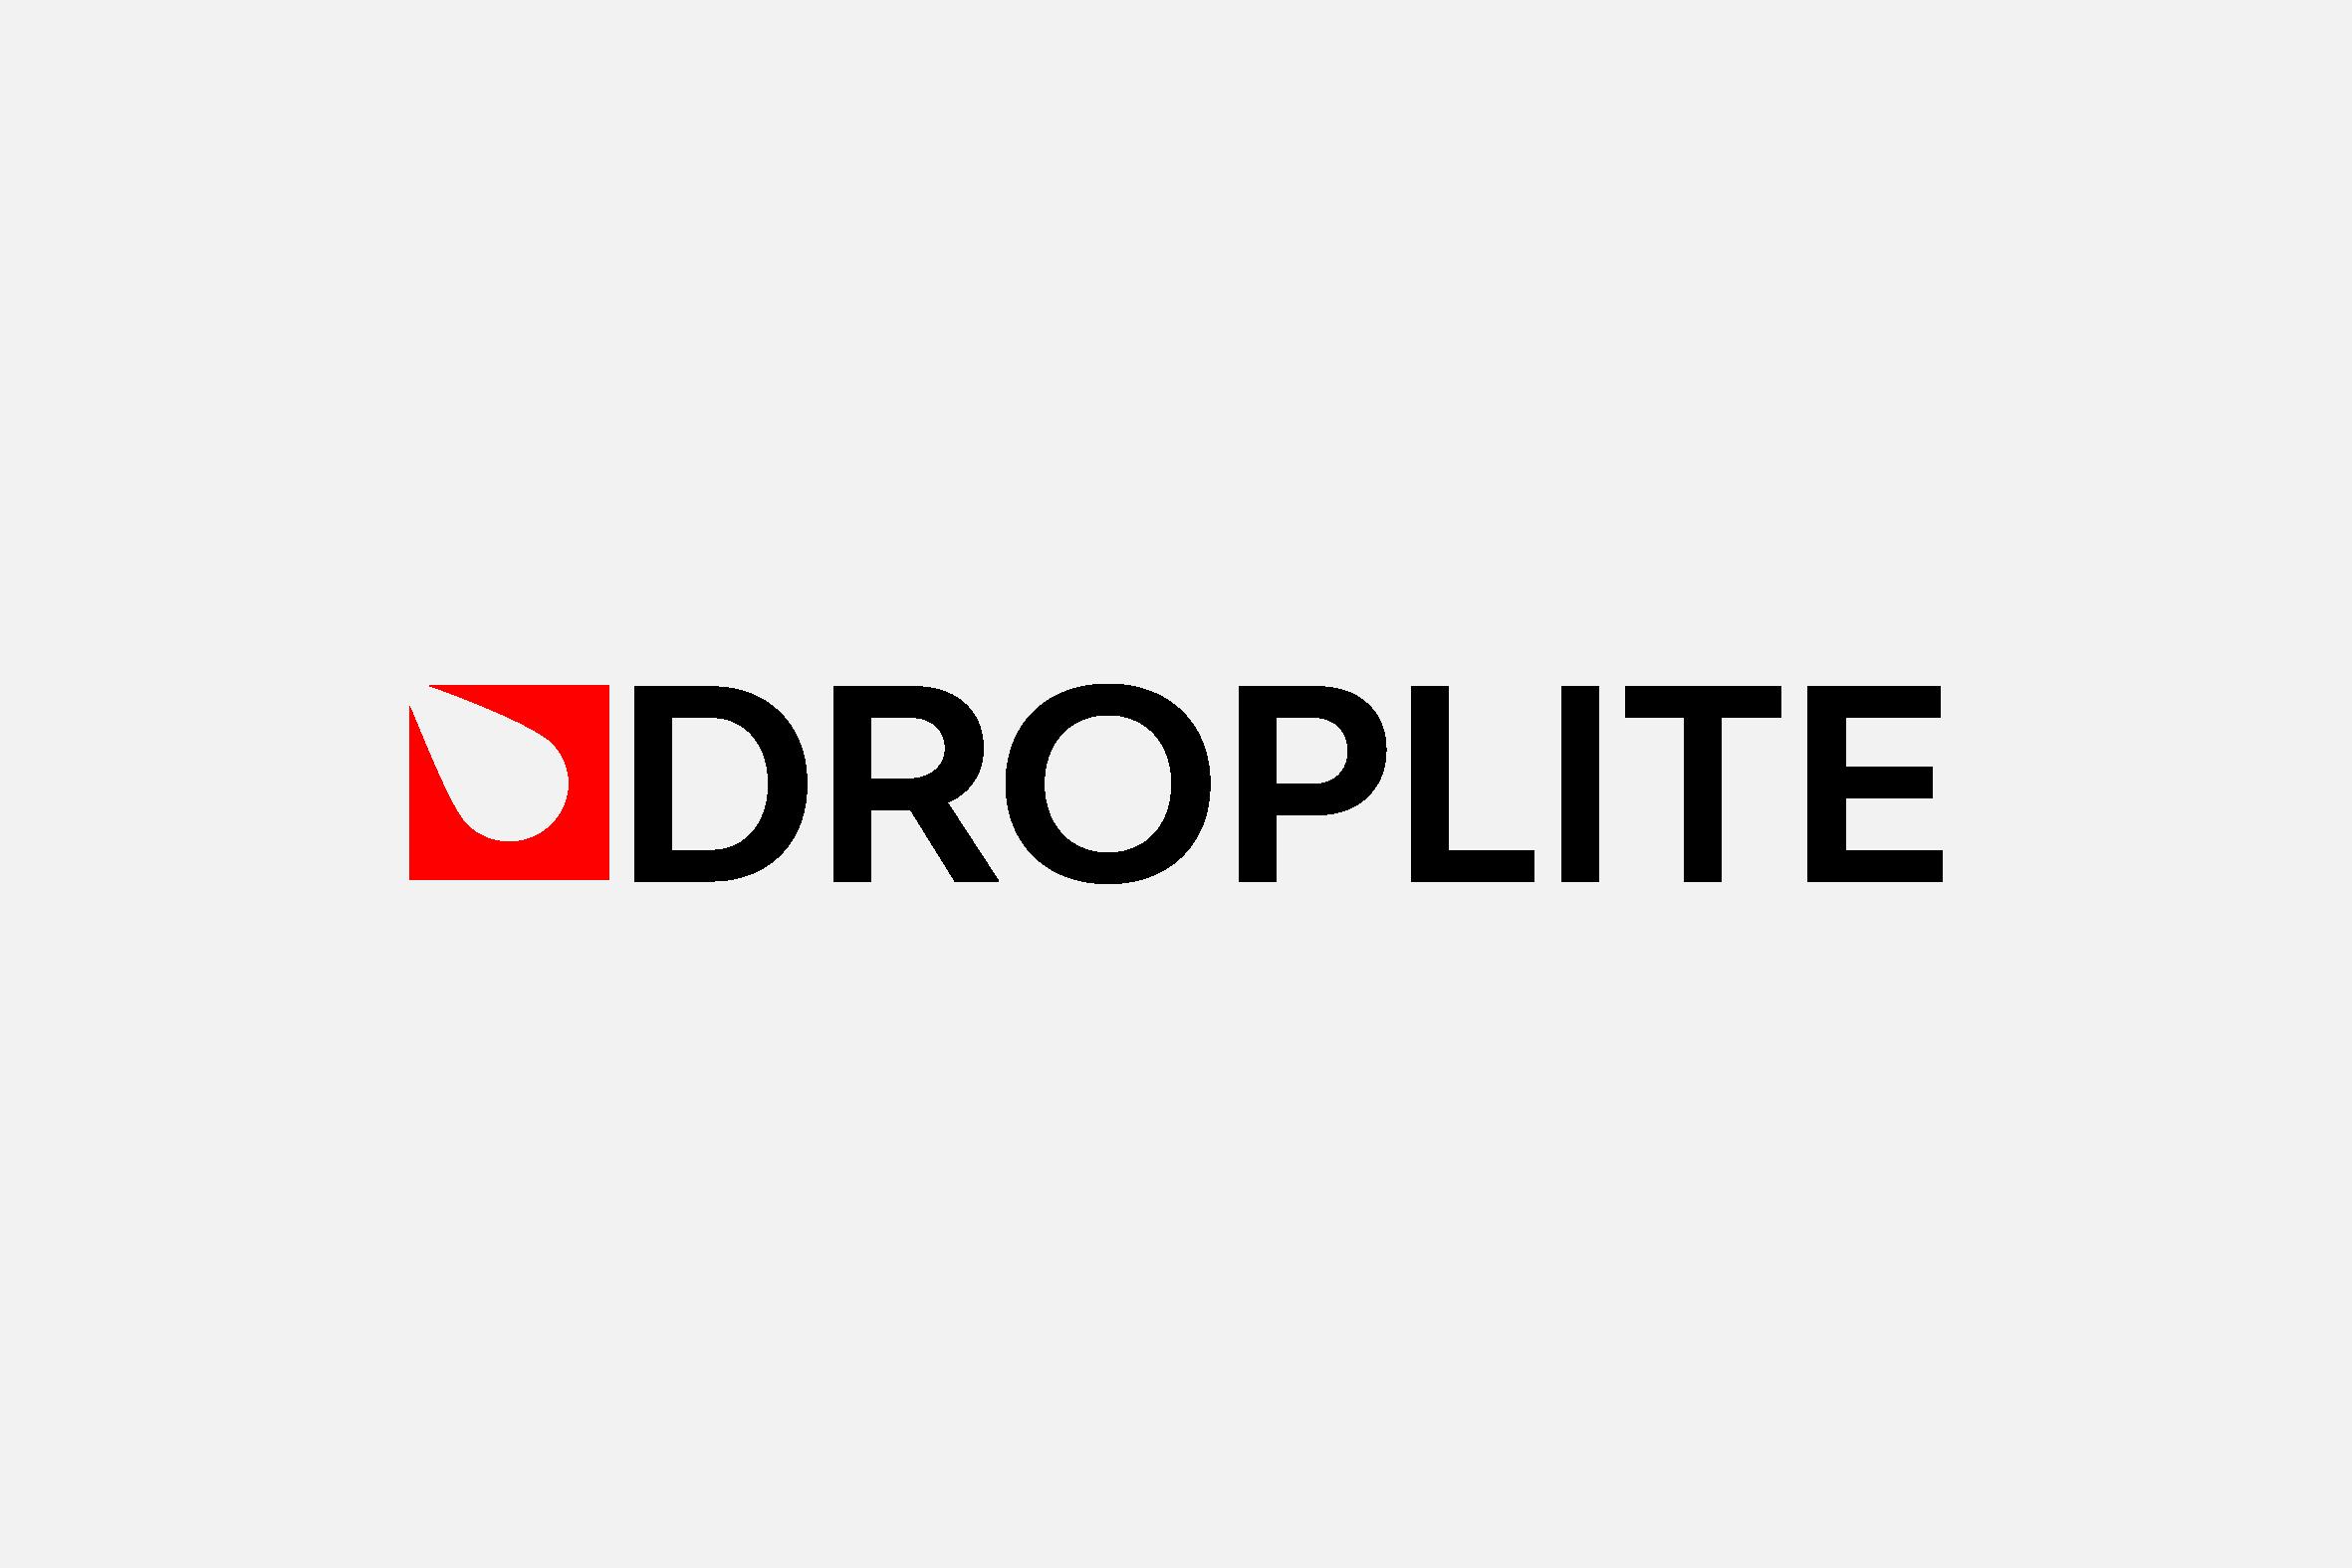 Bitflow-studio-droplite-logo-design-technology-startup-1